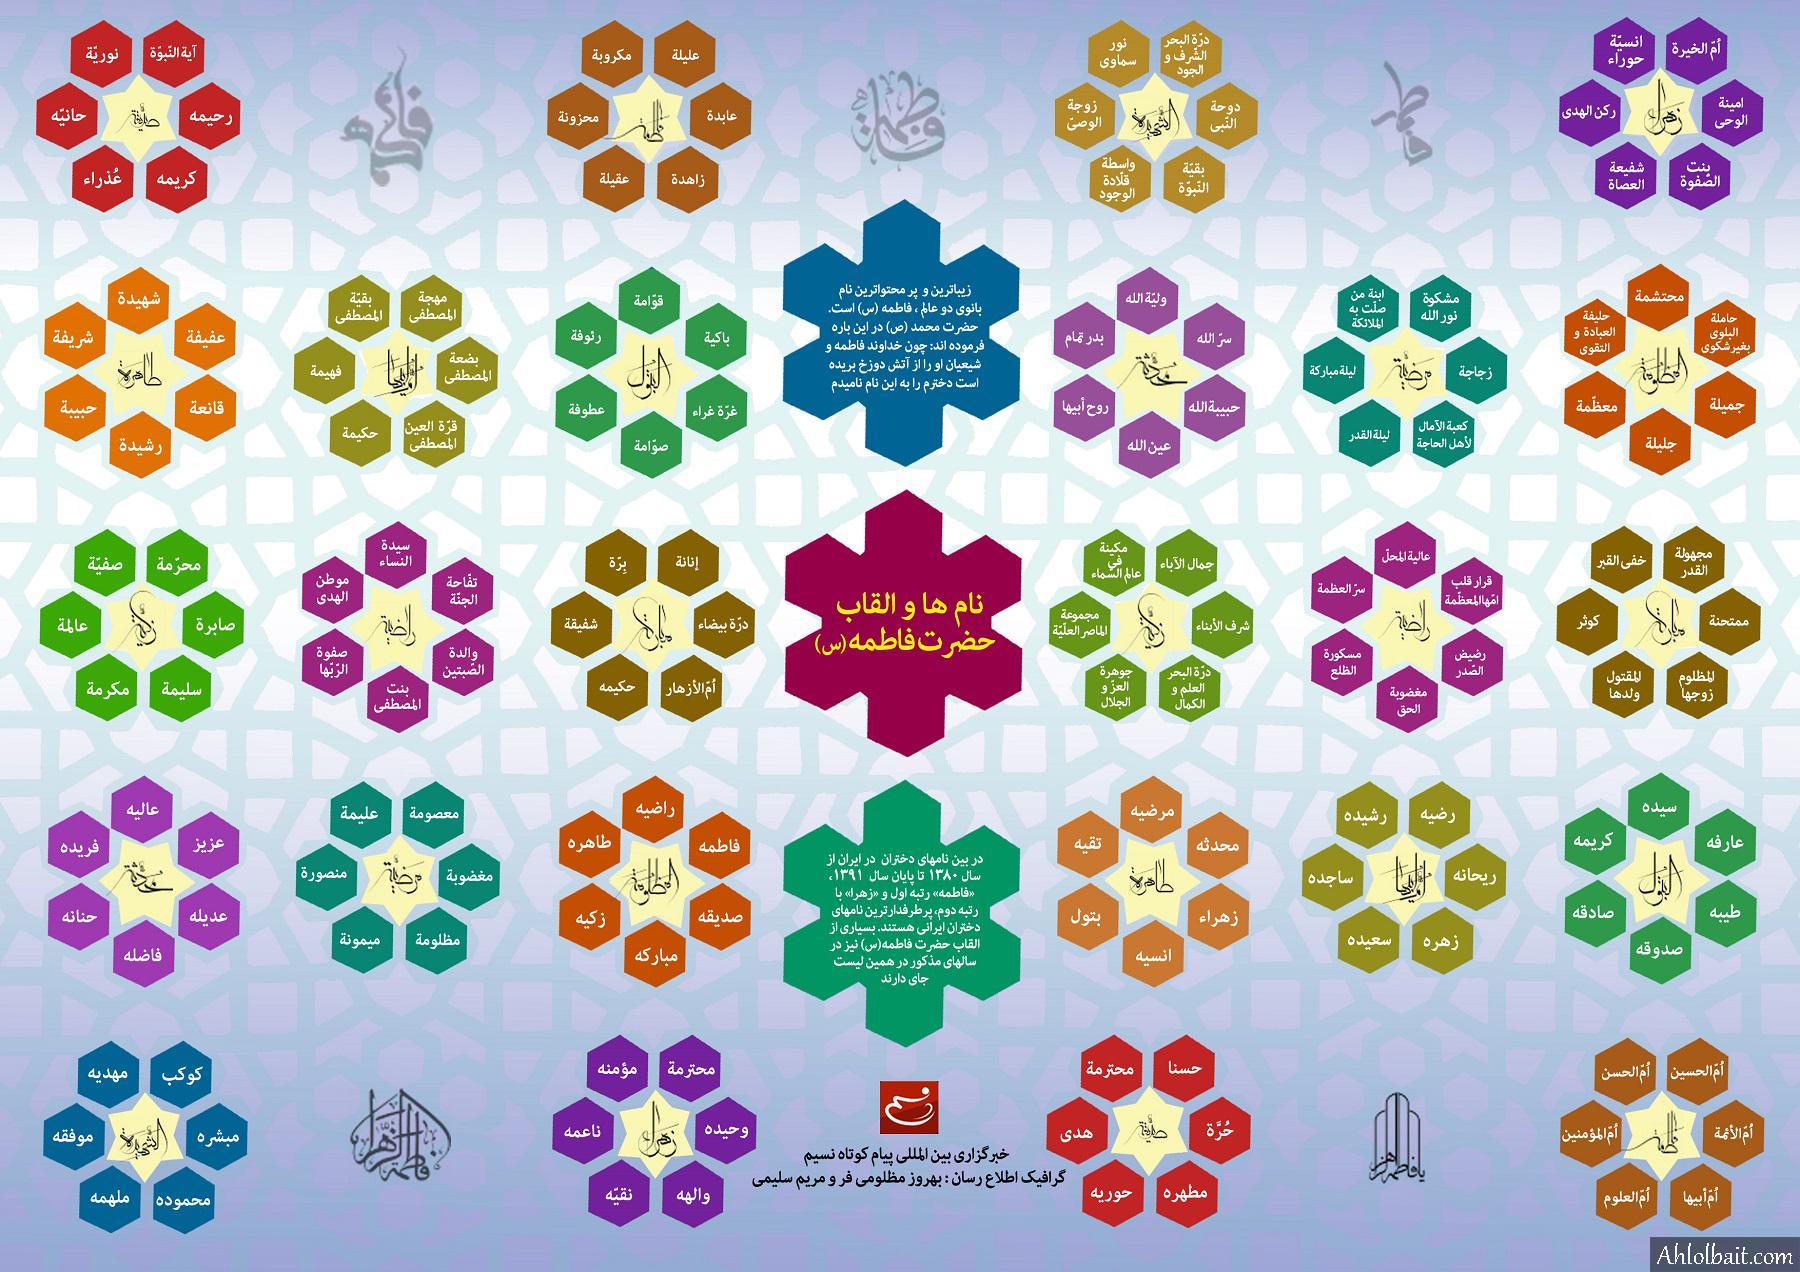 اینفوگرافیک - نامها و القاب حضرت زهرا (س)